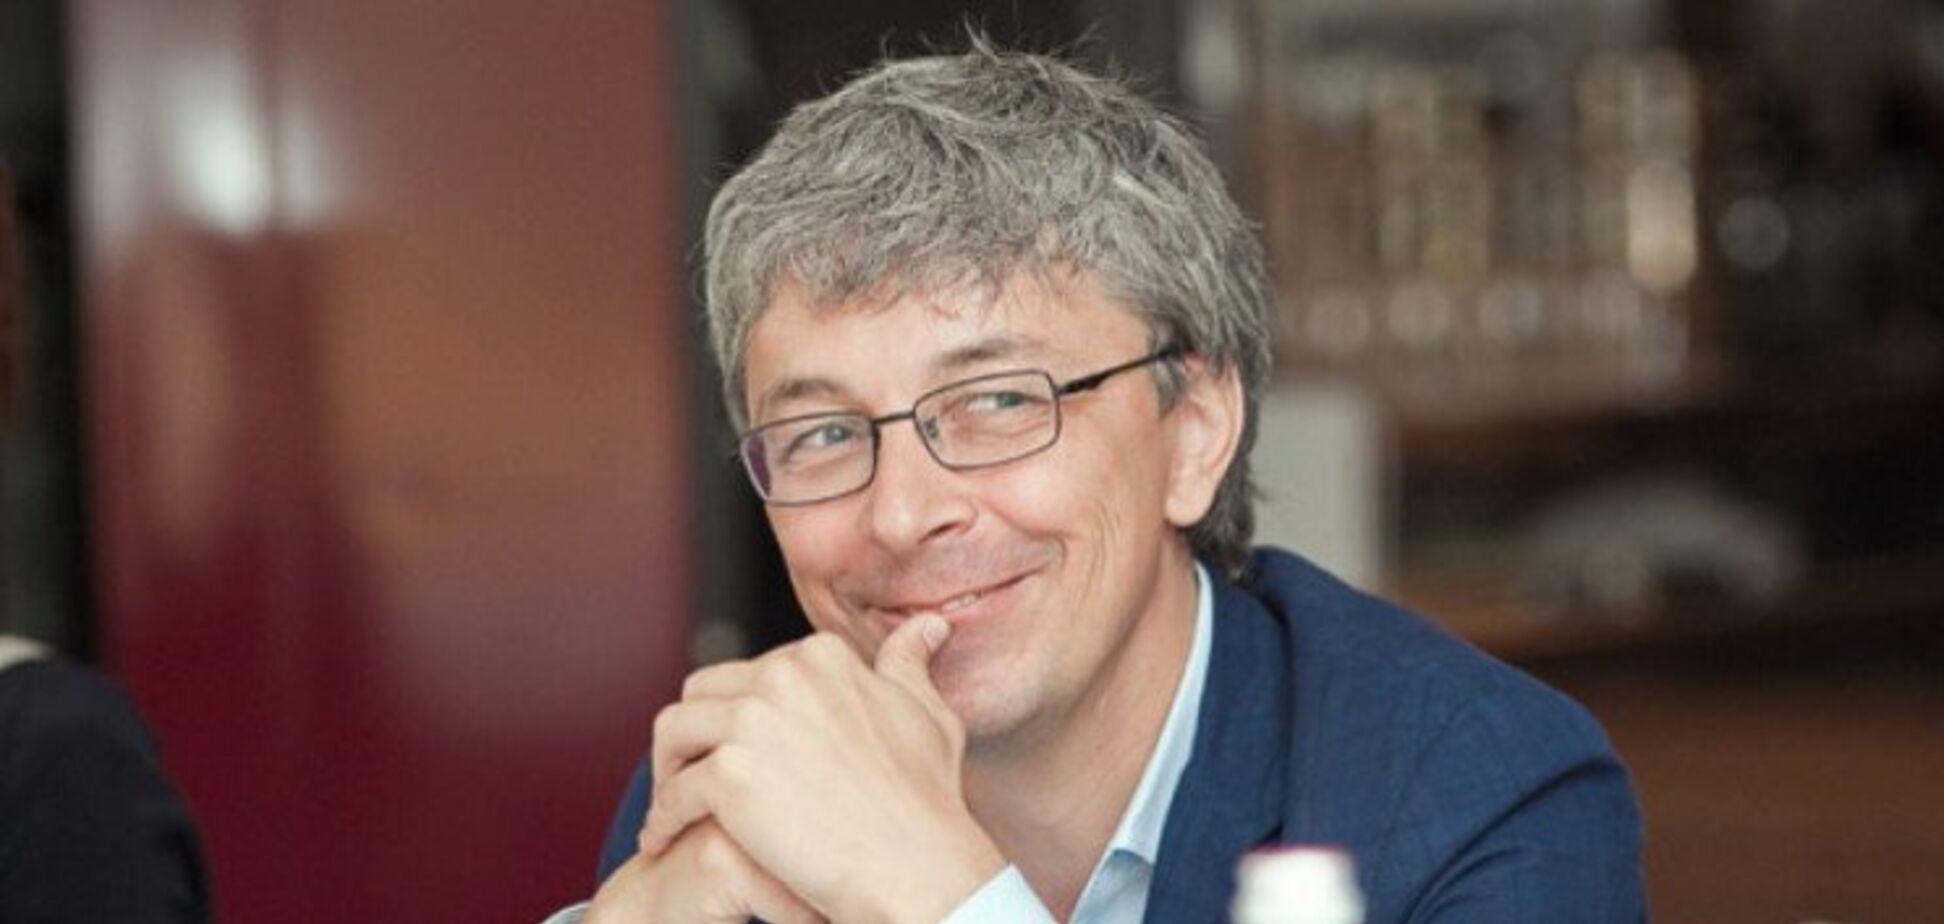 Ткаченко раскрыл планы на выборы мэра Киева